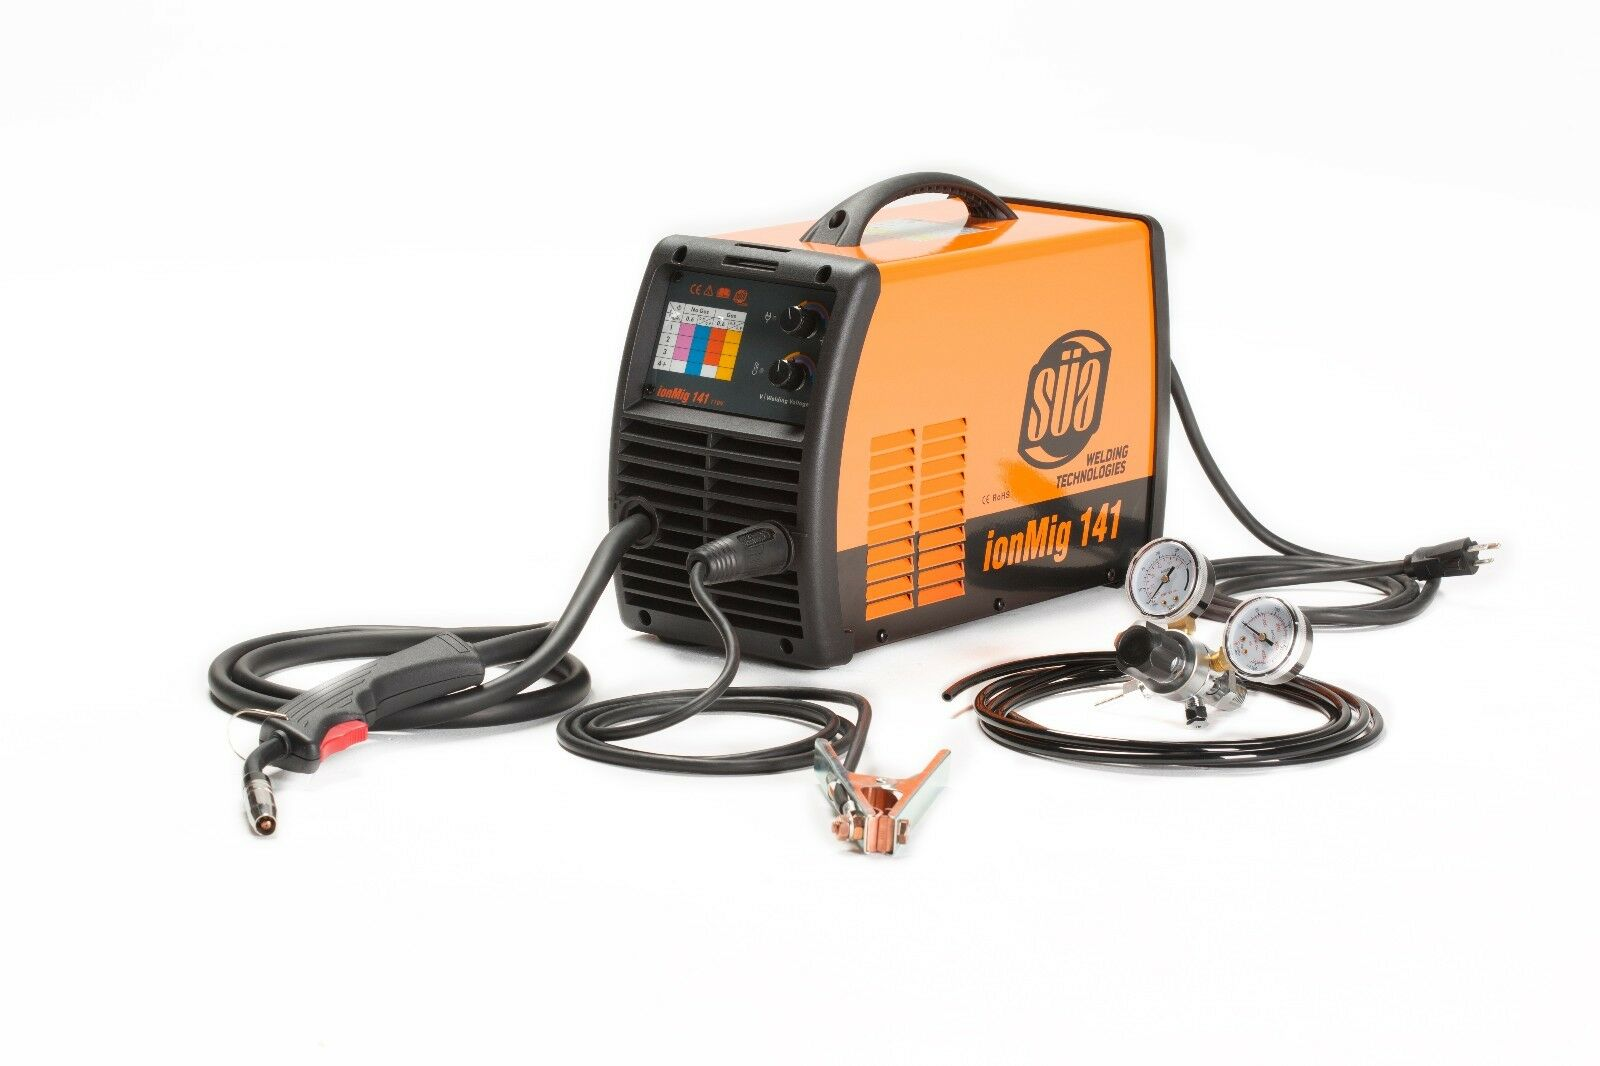 96 Süa ionMig 141 Inverter IGBT MIG Welding Machine - 110 Volts